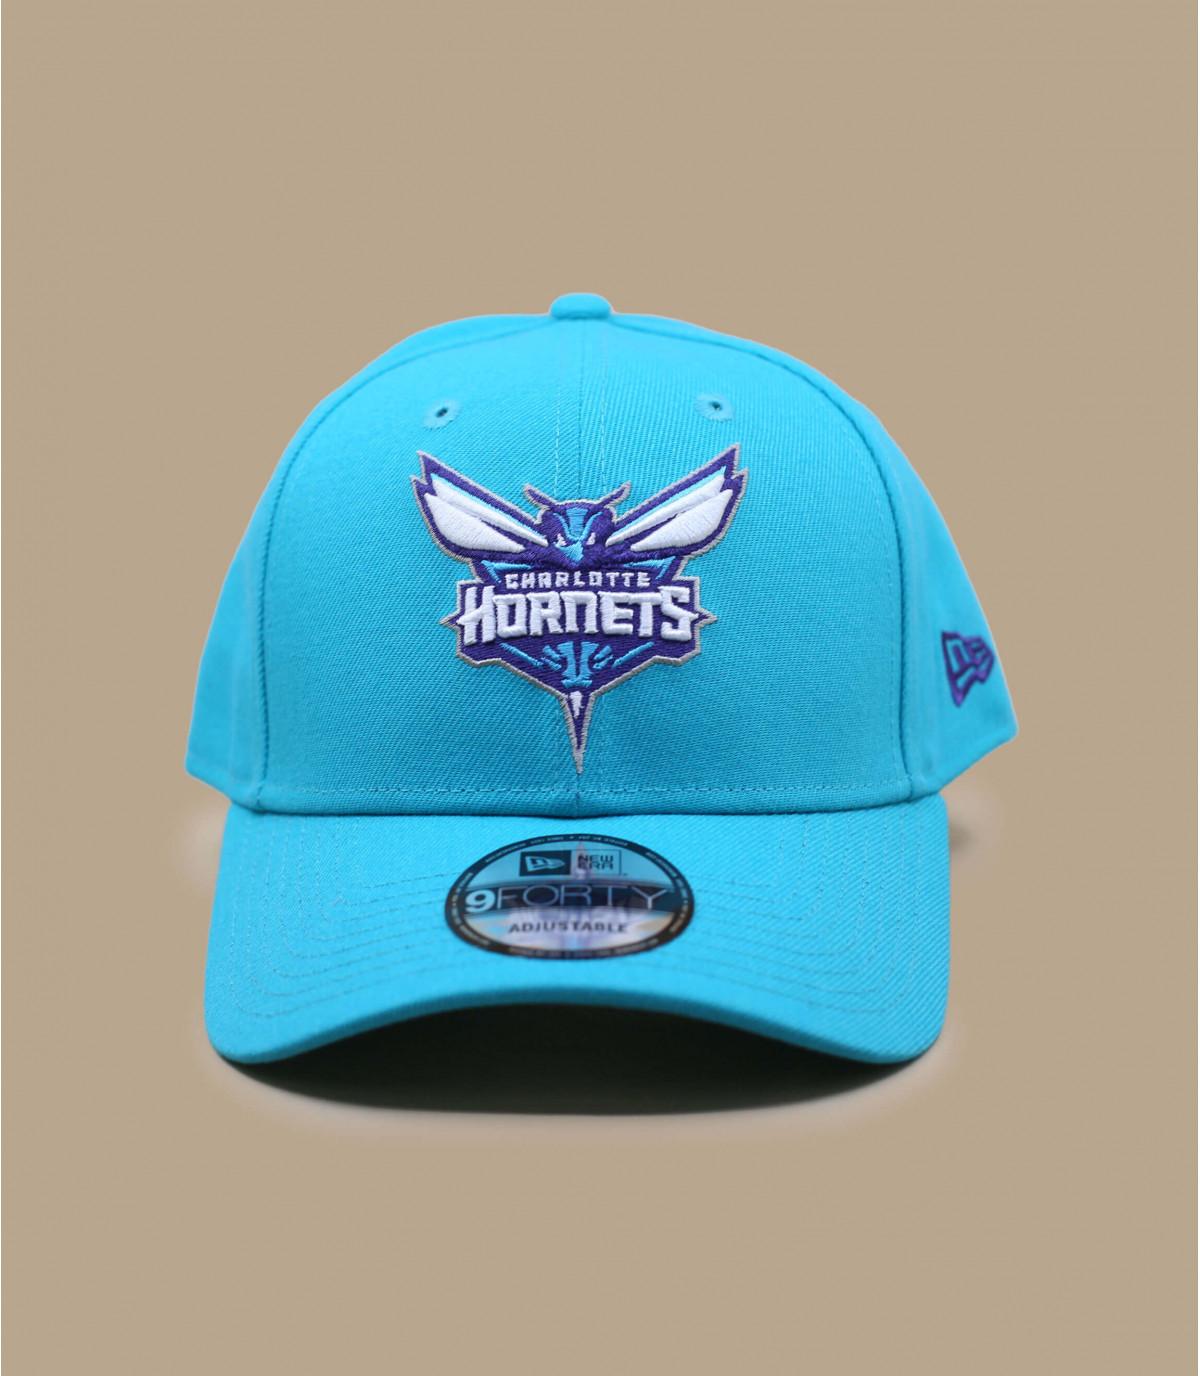 gorra Hornets azul curva